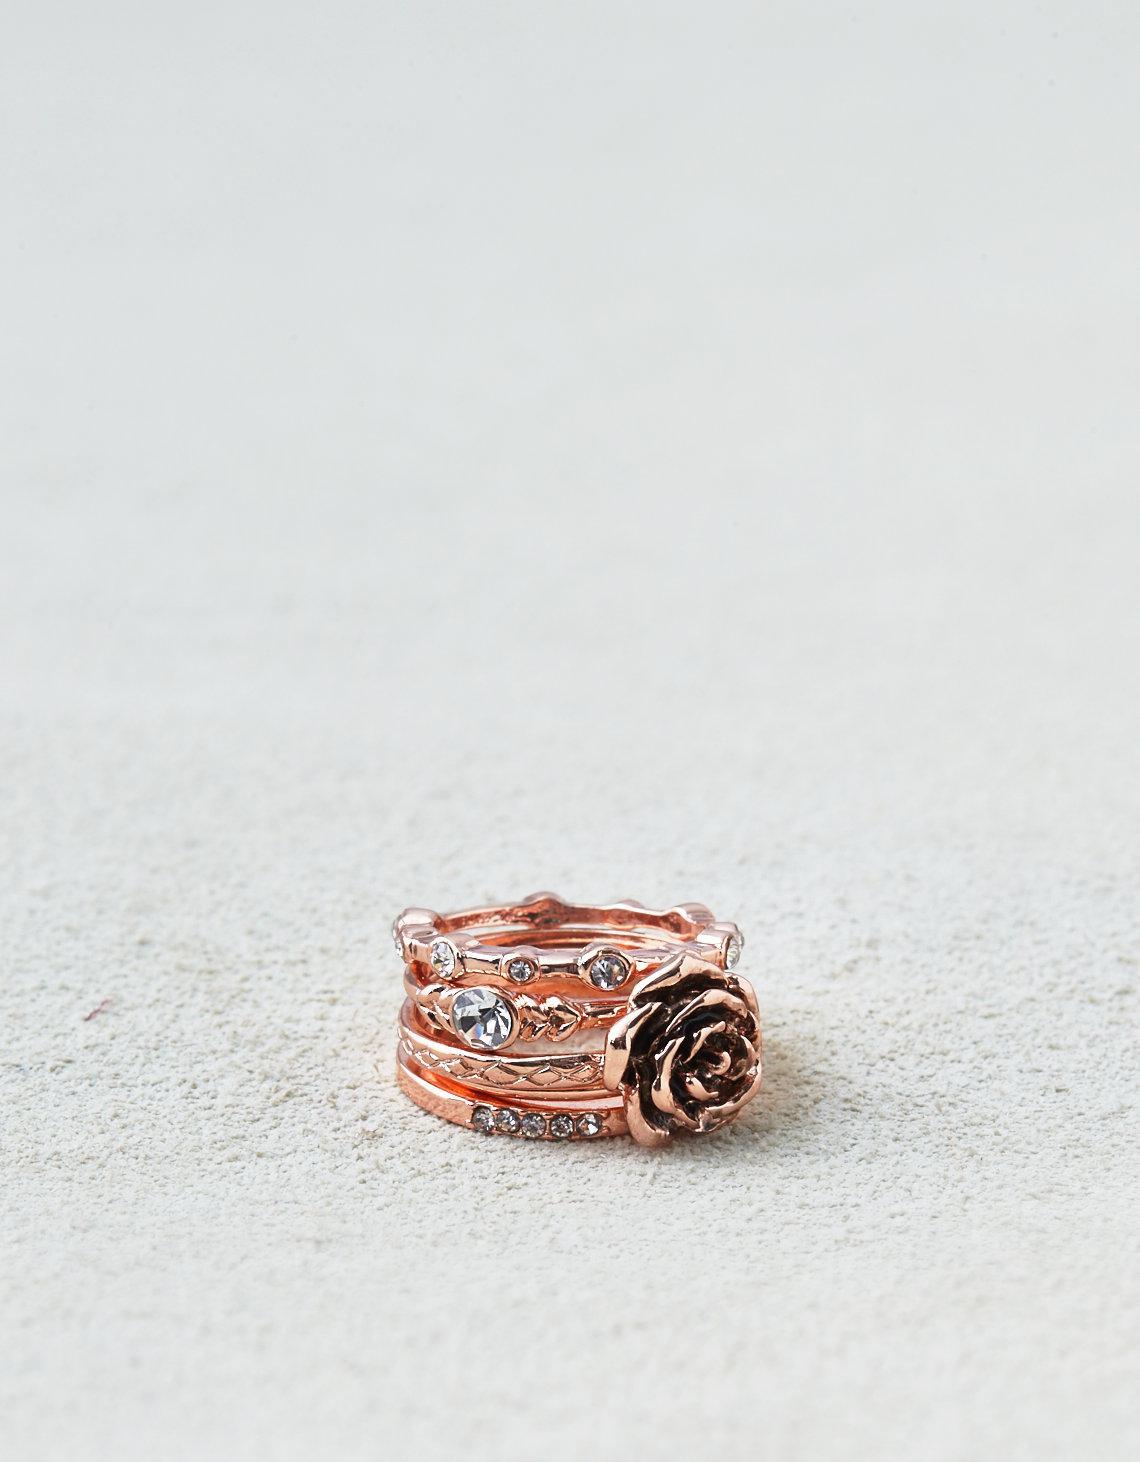 Lyst - American Eagle Ae Rose & Stones Rings 5-pack in Pink